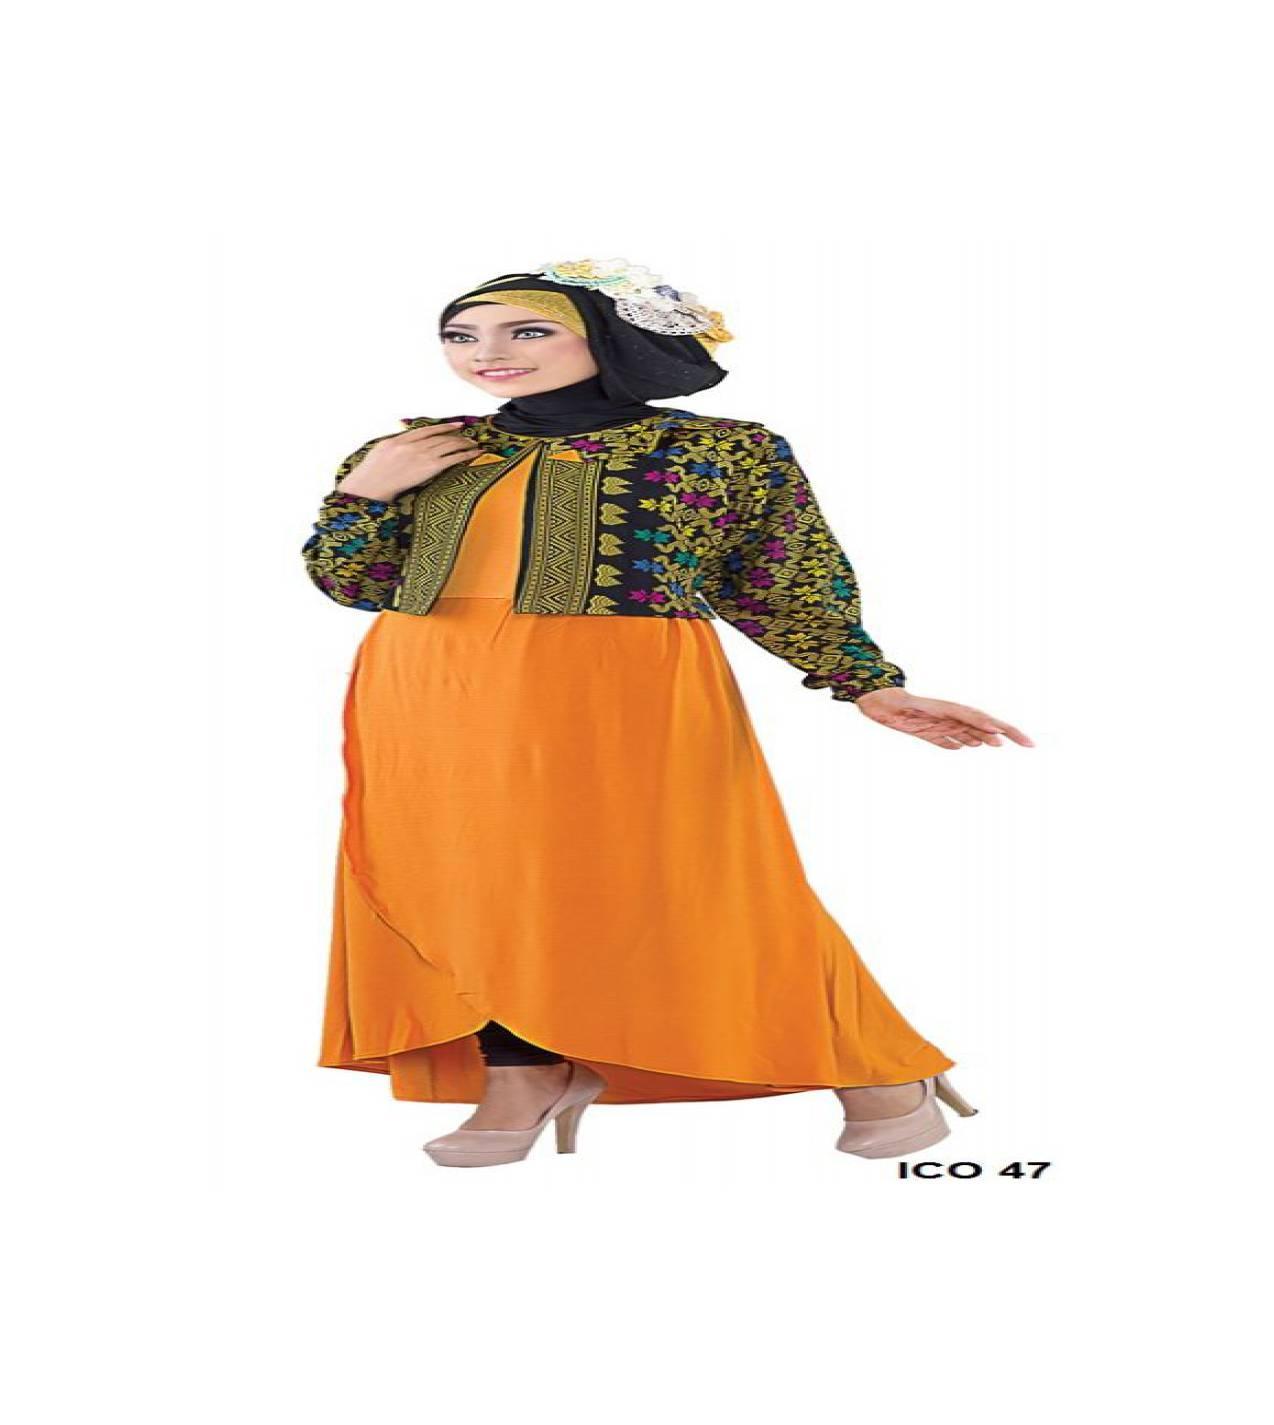 GFP - Gamis Dewasa Jersey Batik Batik Kuning ICO 47